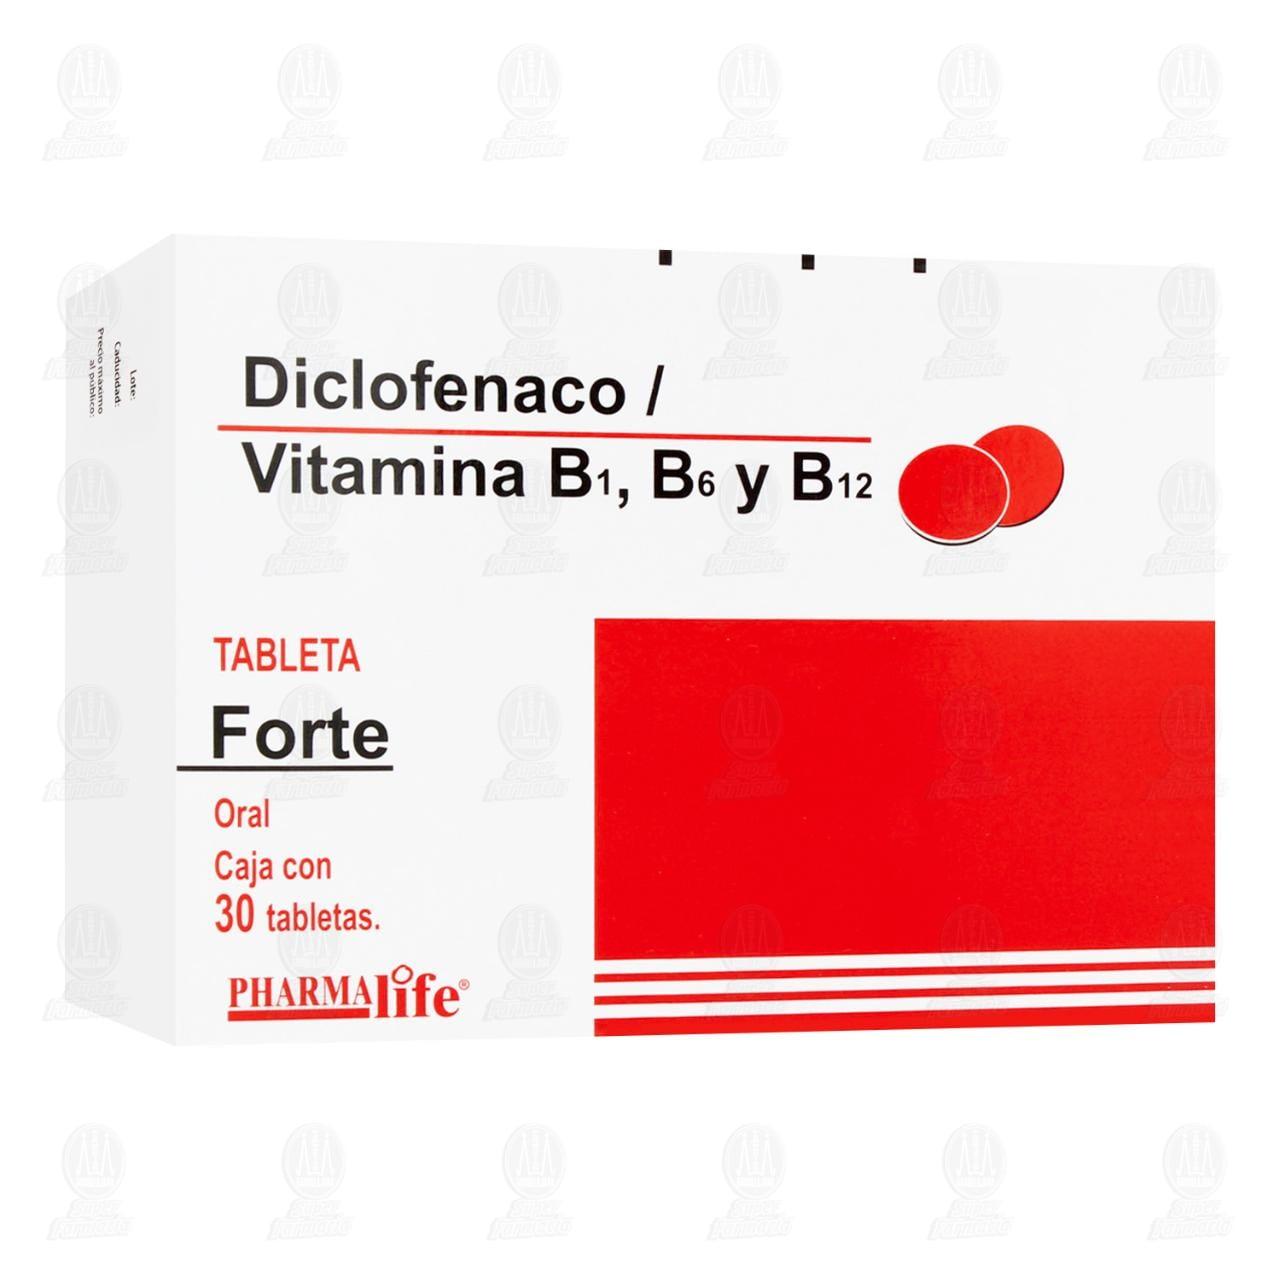 Comprar Diclofenaco Forte 30 Tabletas Pharmalife en Farmacias Guadalajara